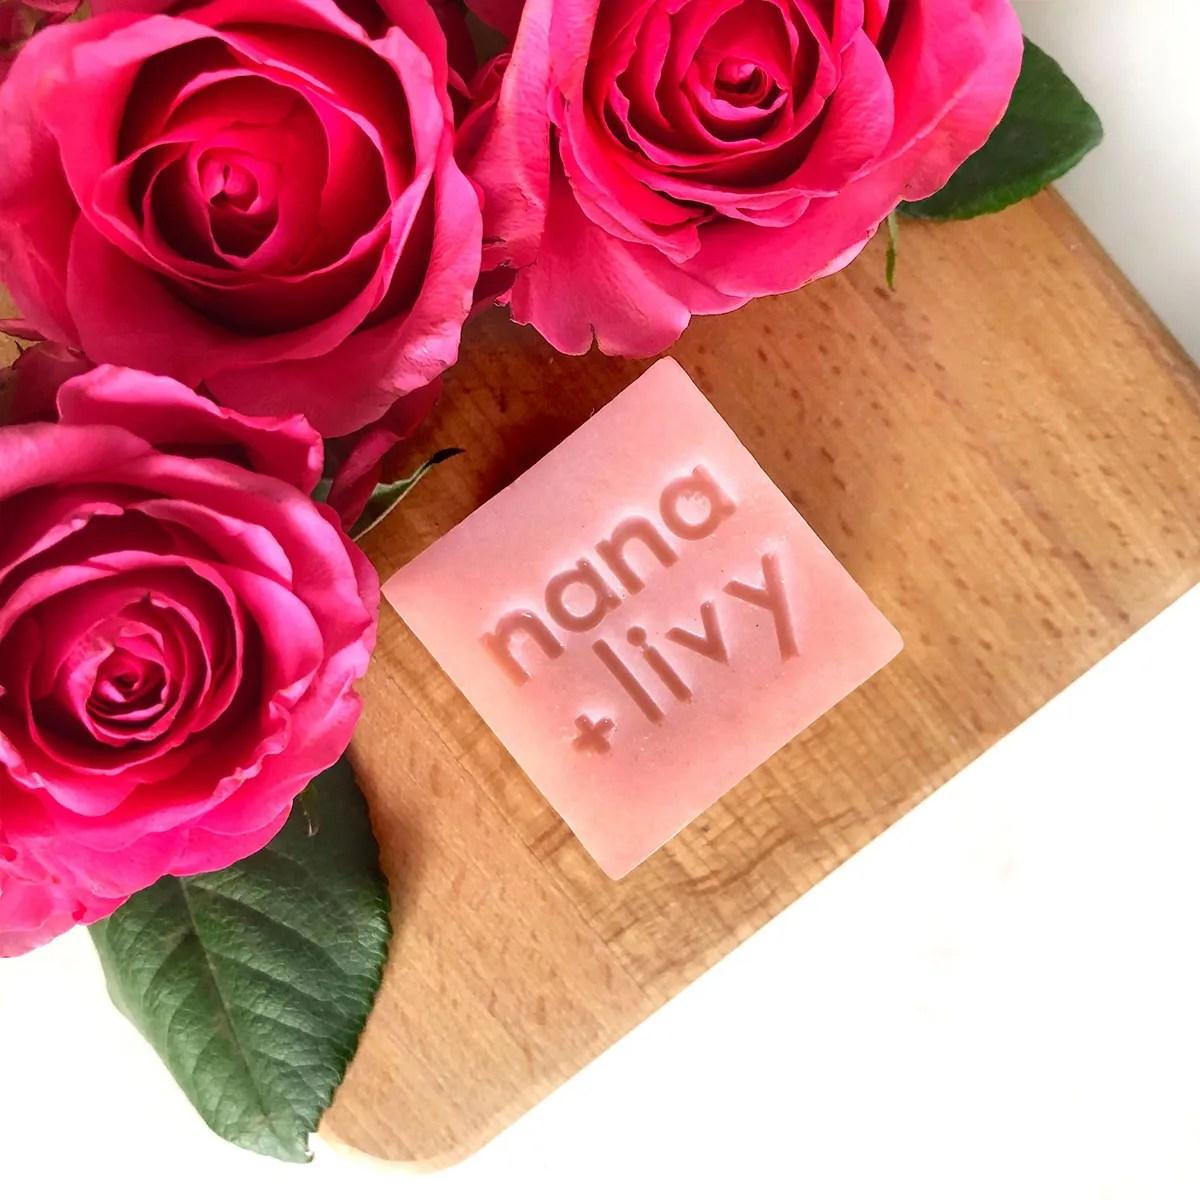 Rose Soap Block